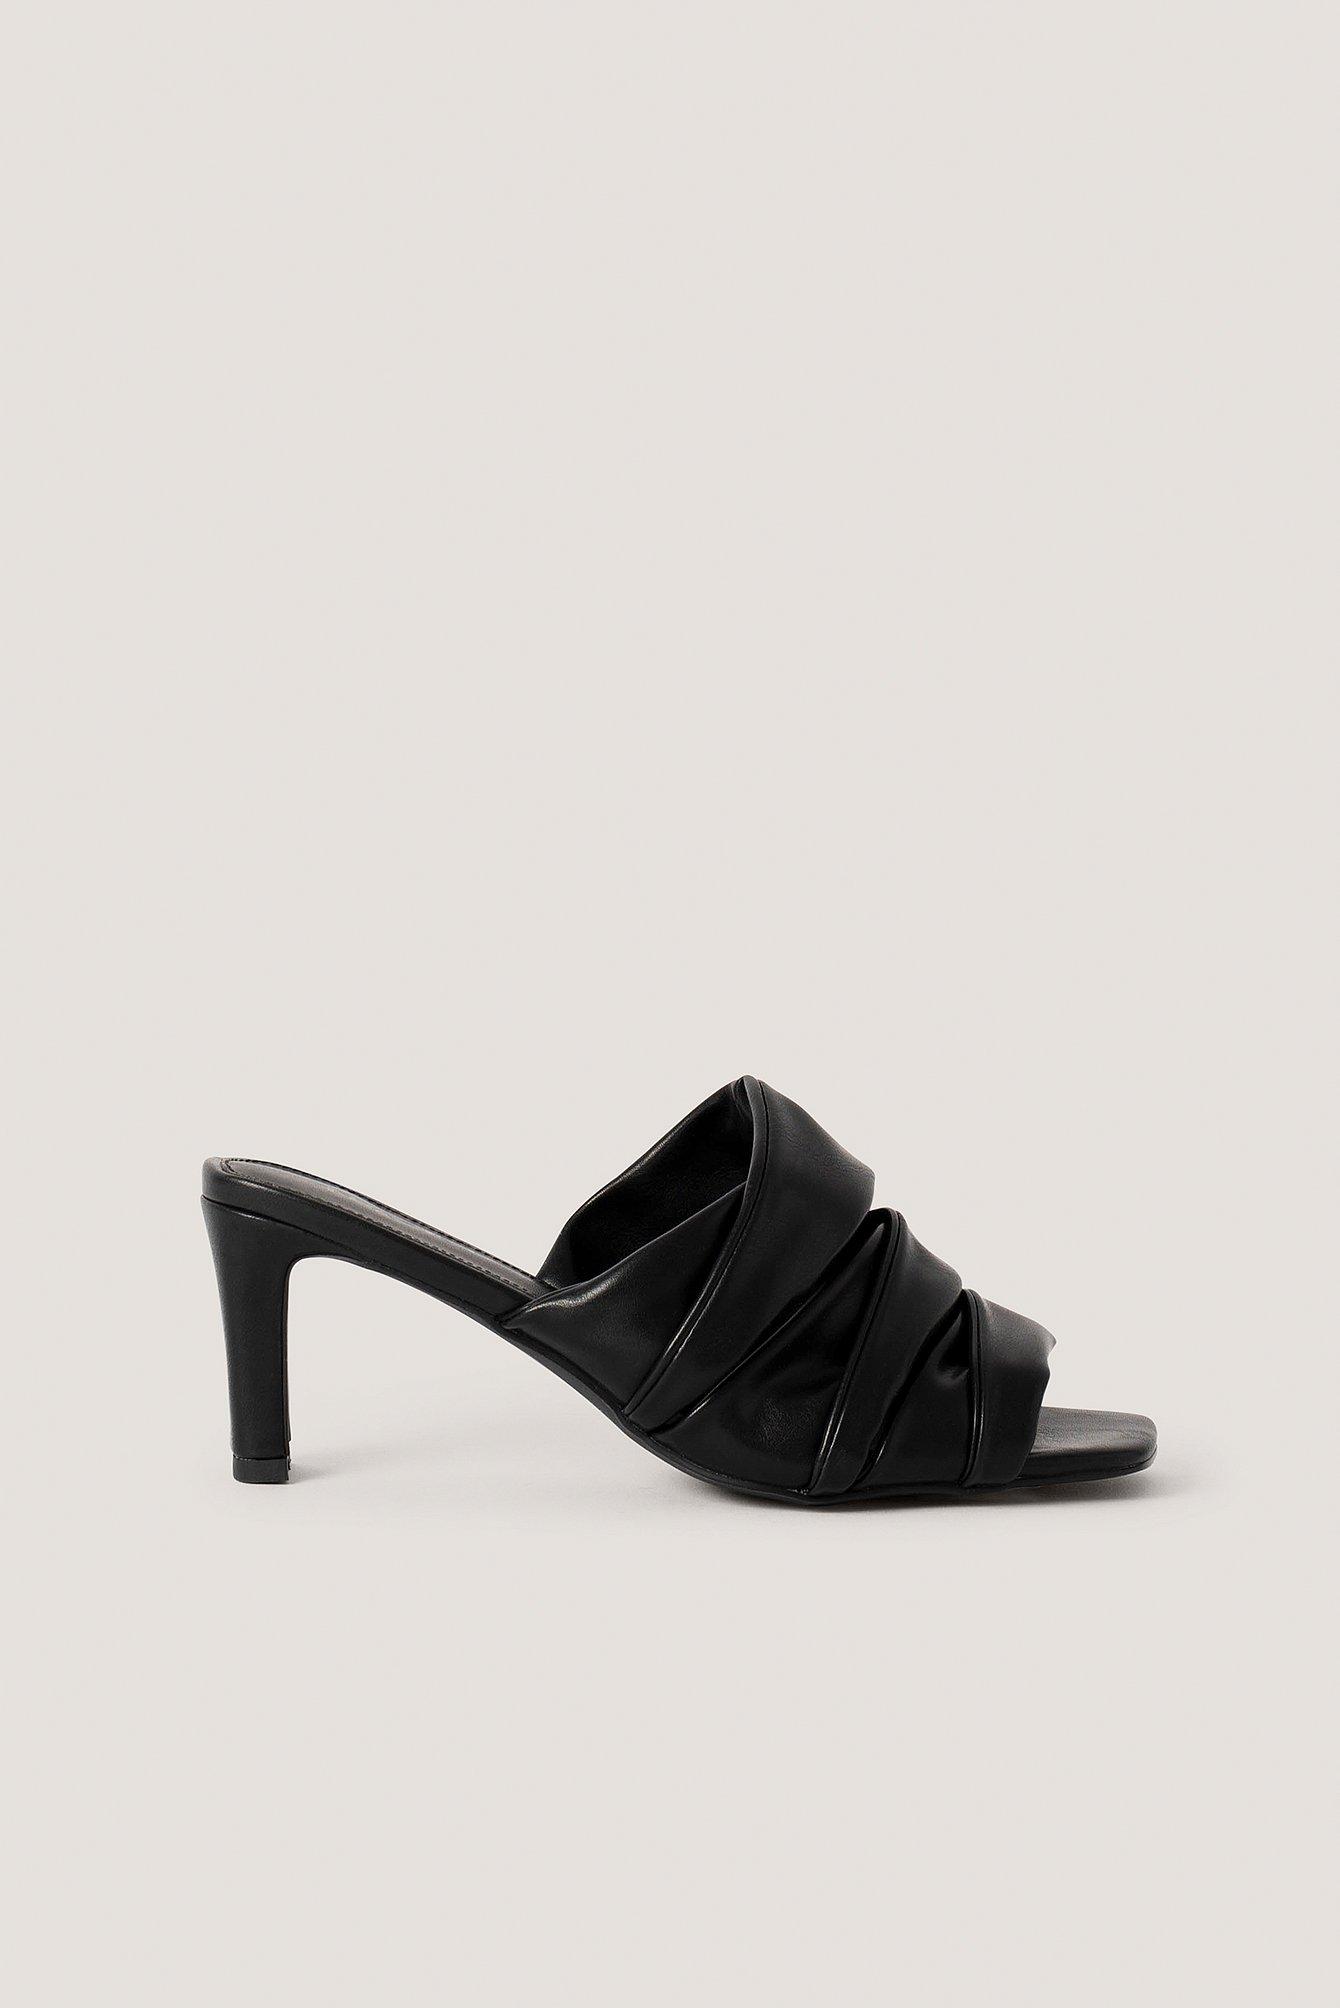 na-kd shoes -  Layered Upper Mules - Black